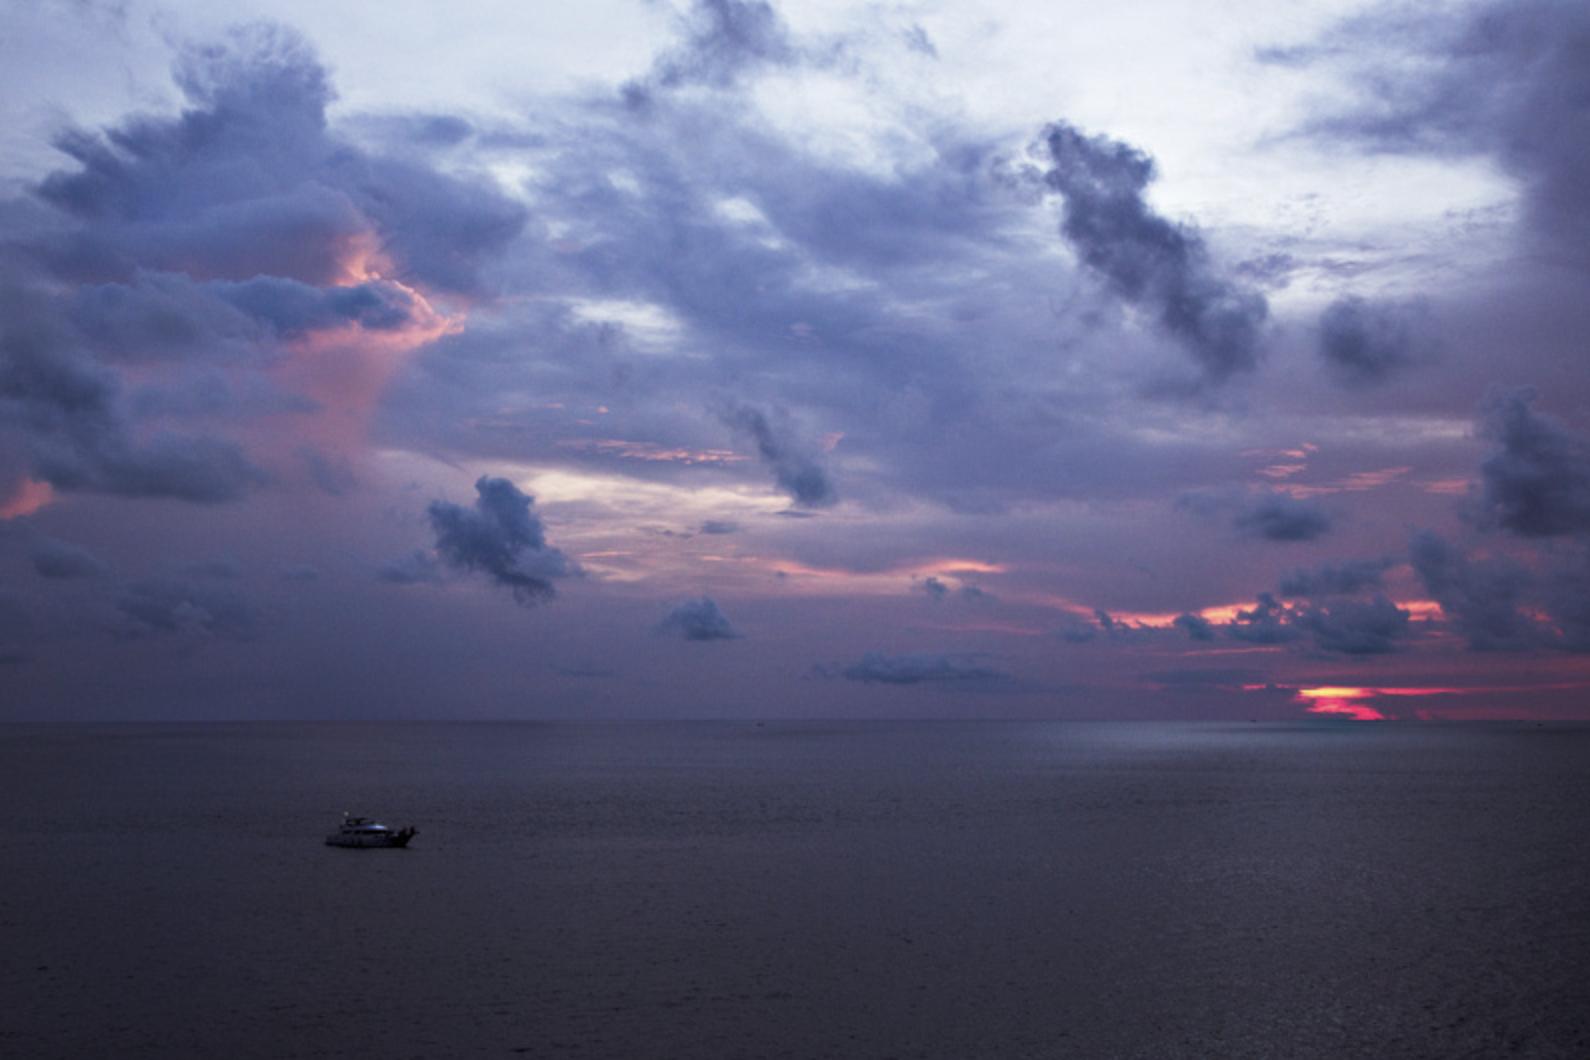 Sunset at Promthep Cape, Phuket.